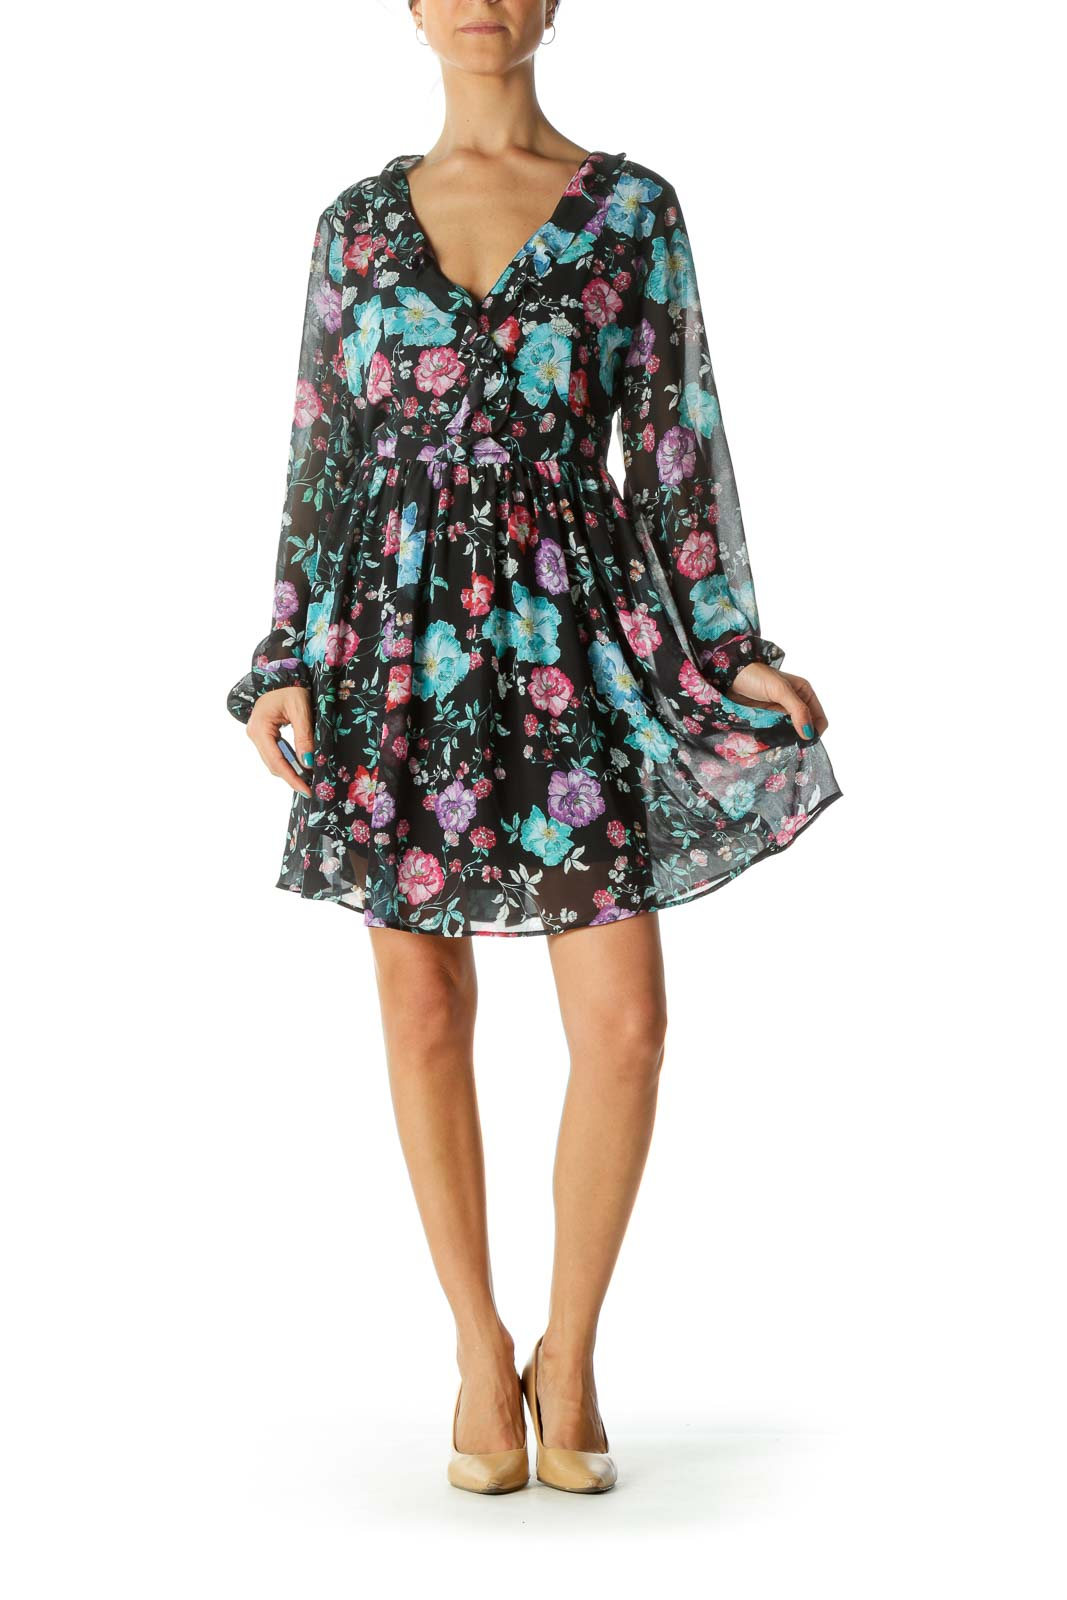 Black Floral Print Long Sleeve Deep V-Neck Day Dress